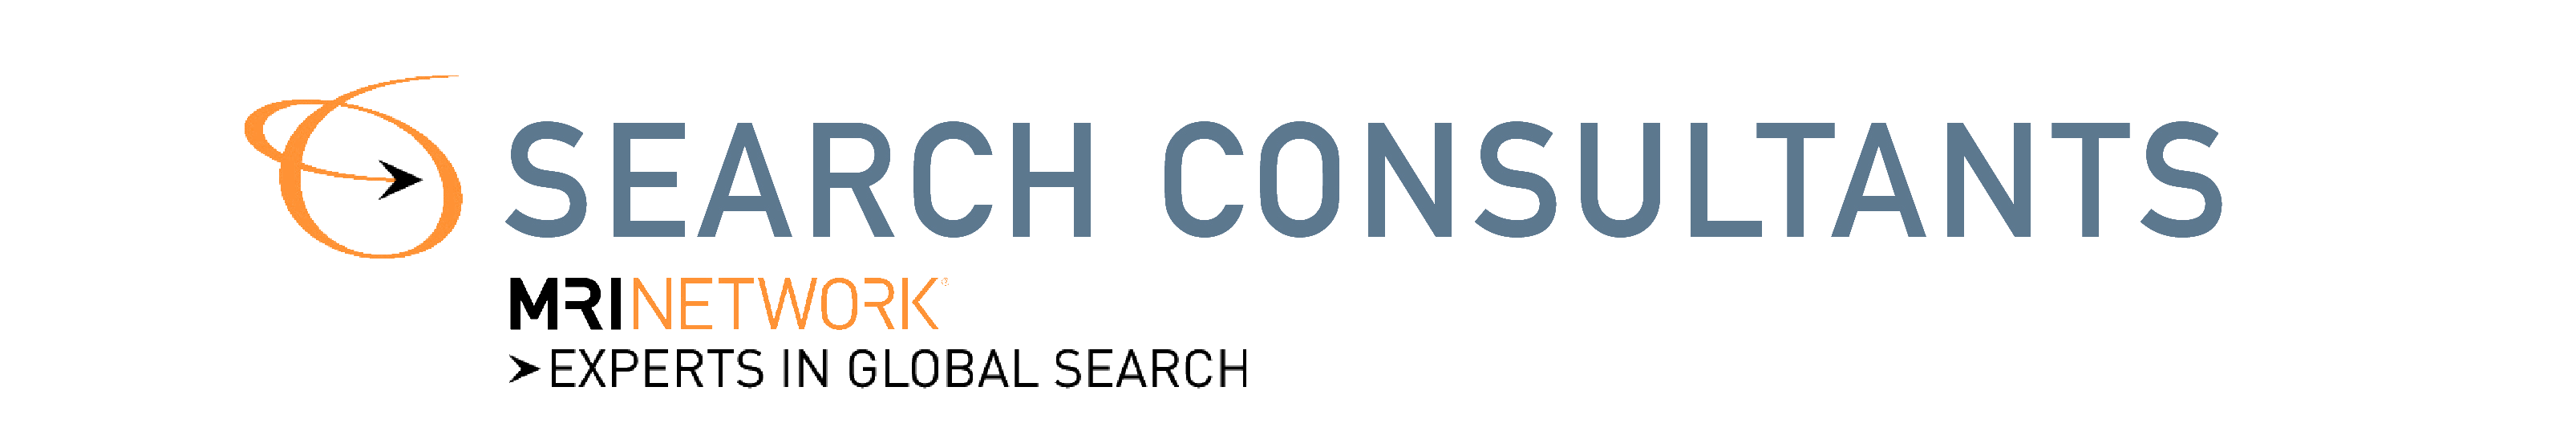 Search Consultants